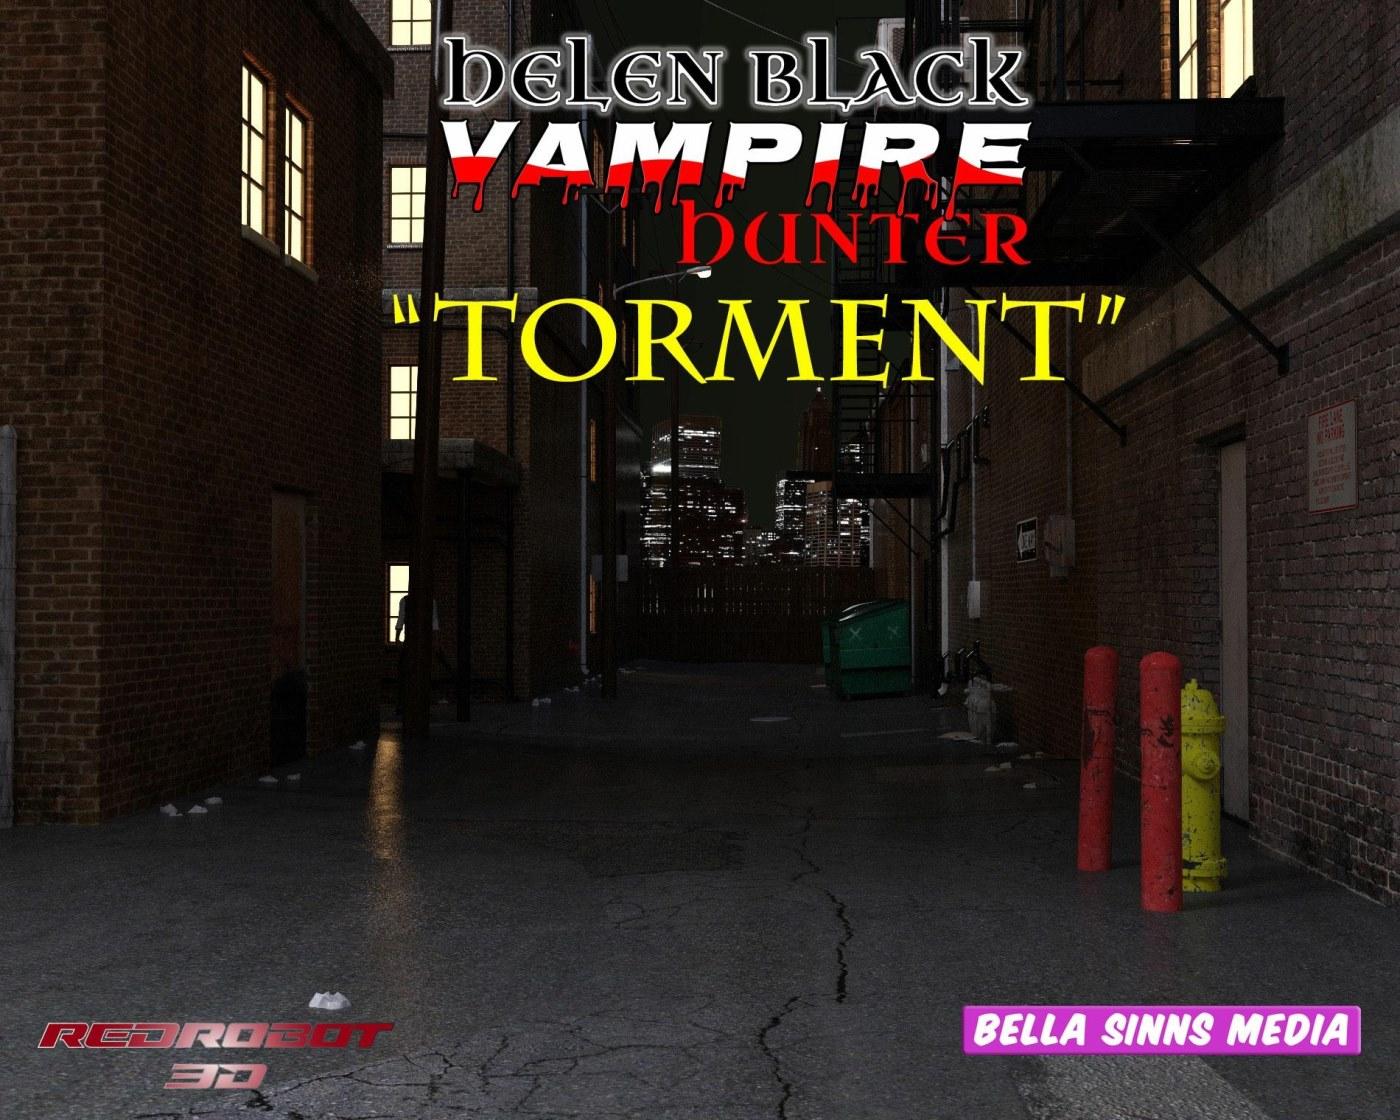 Vampire Hunter 4 – Torment- Redrobot3D image 1